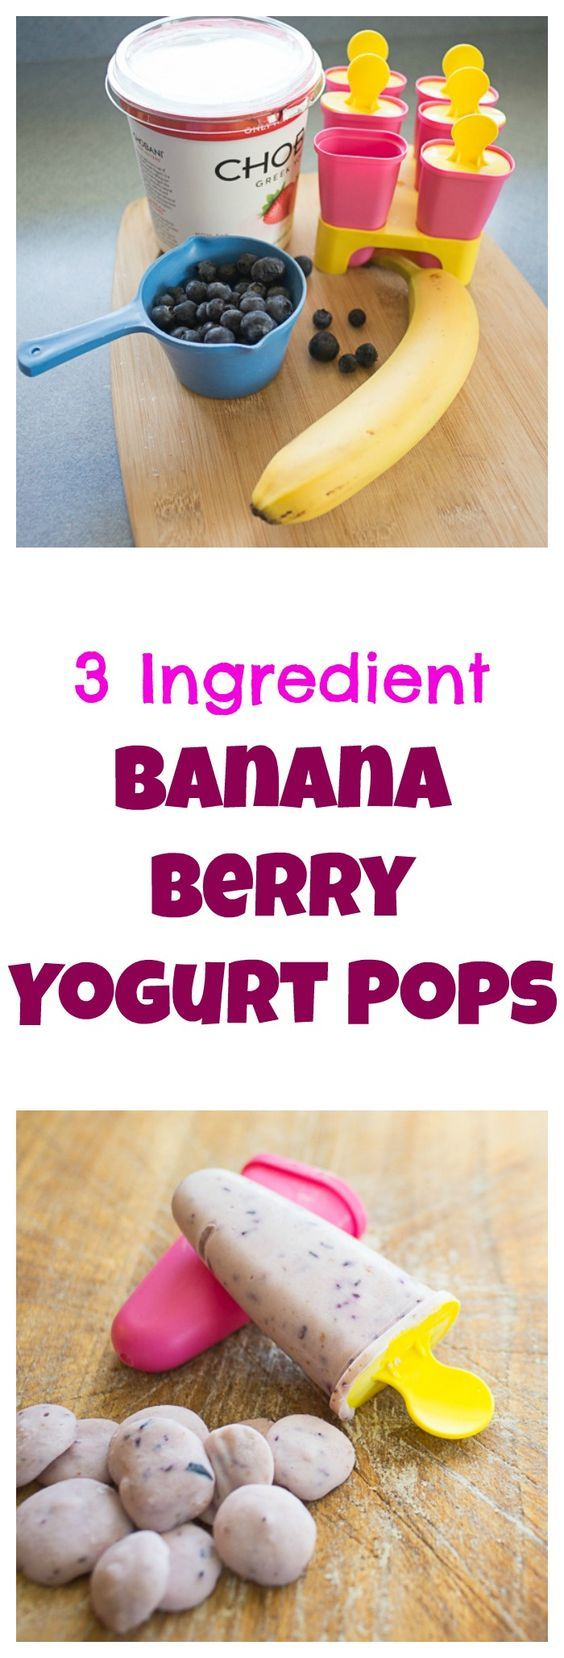 Banana berry yoghurt pops